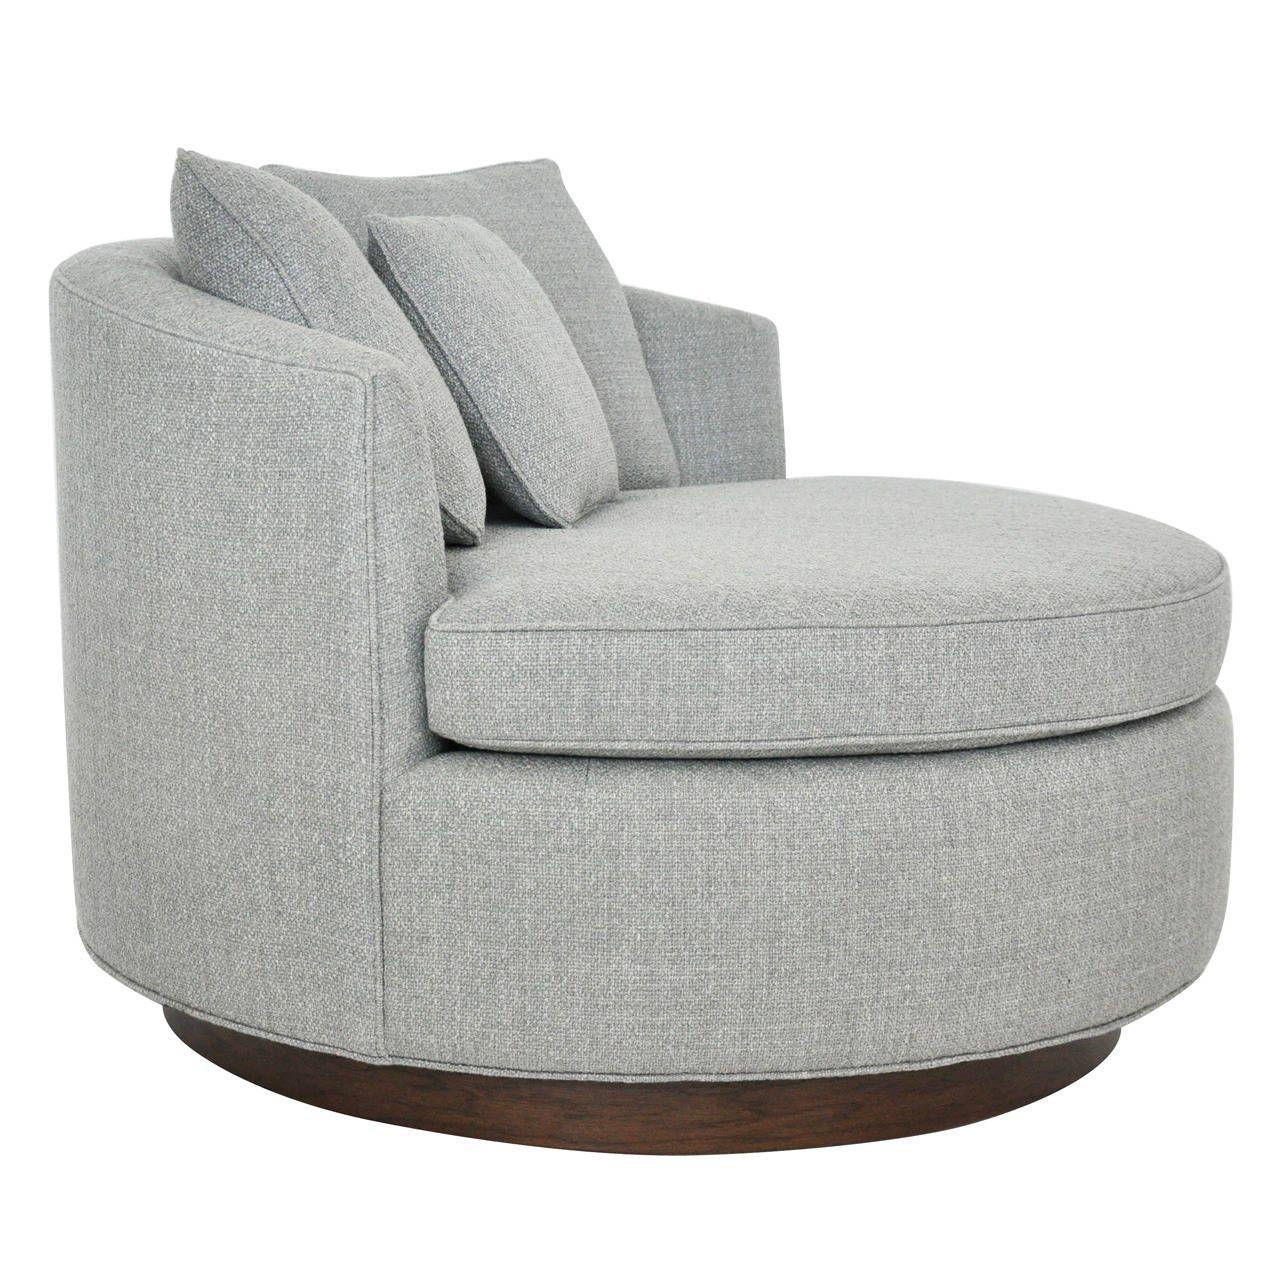 Large Milo Baughman Swivel Chair